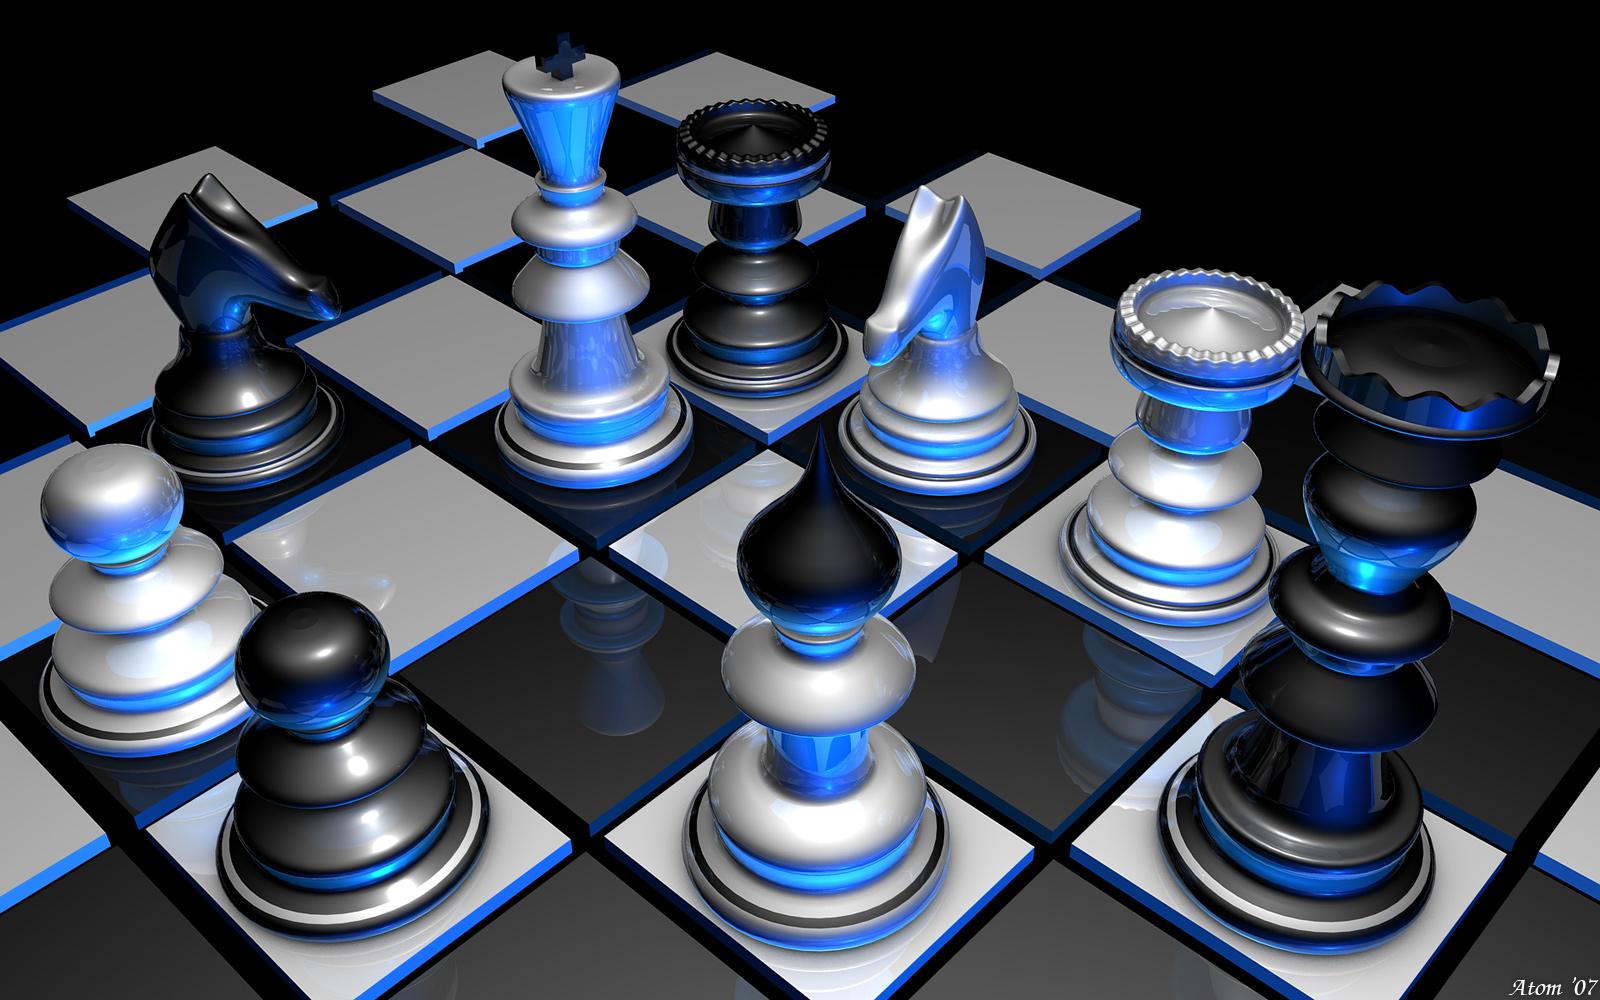 http://4.bp.blogspot.com/_Ym3du2sG3R4/S-1iJdmLNYI/AAAAAAAACSI/z2Thxu2lMcQ/s1600/3D-Chess-wallpaper_1600x1000.jpg